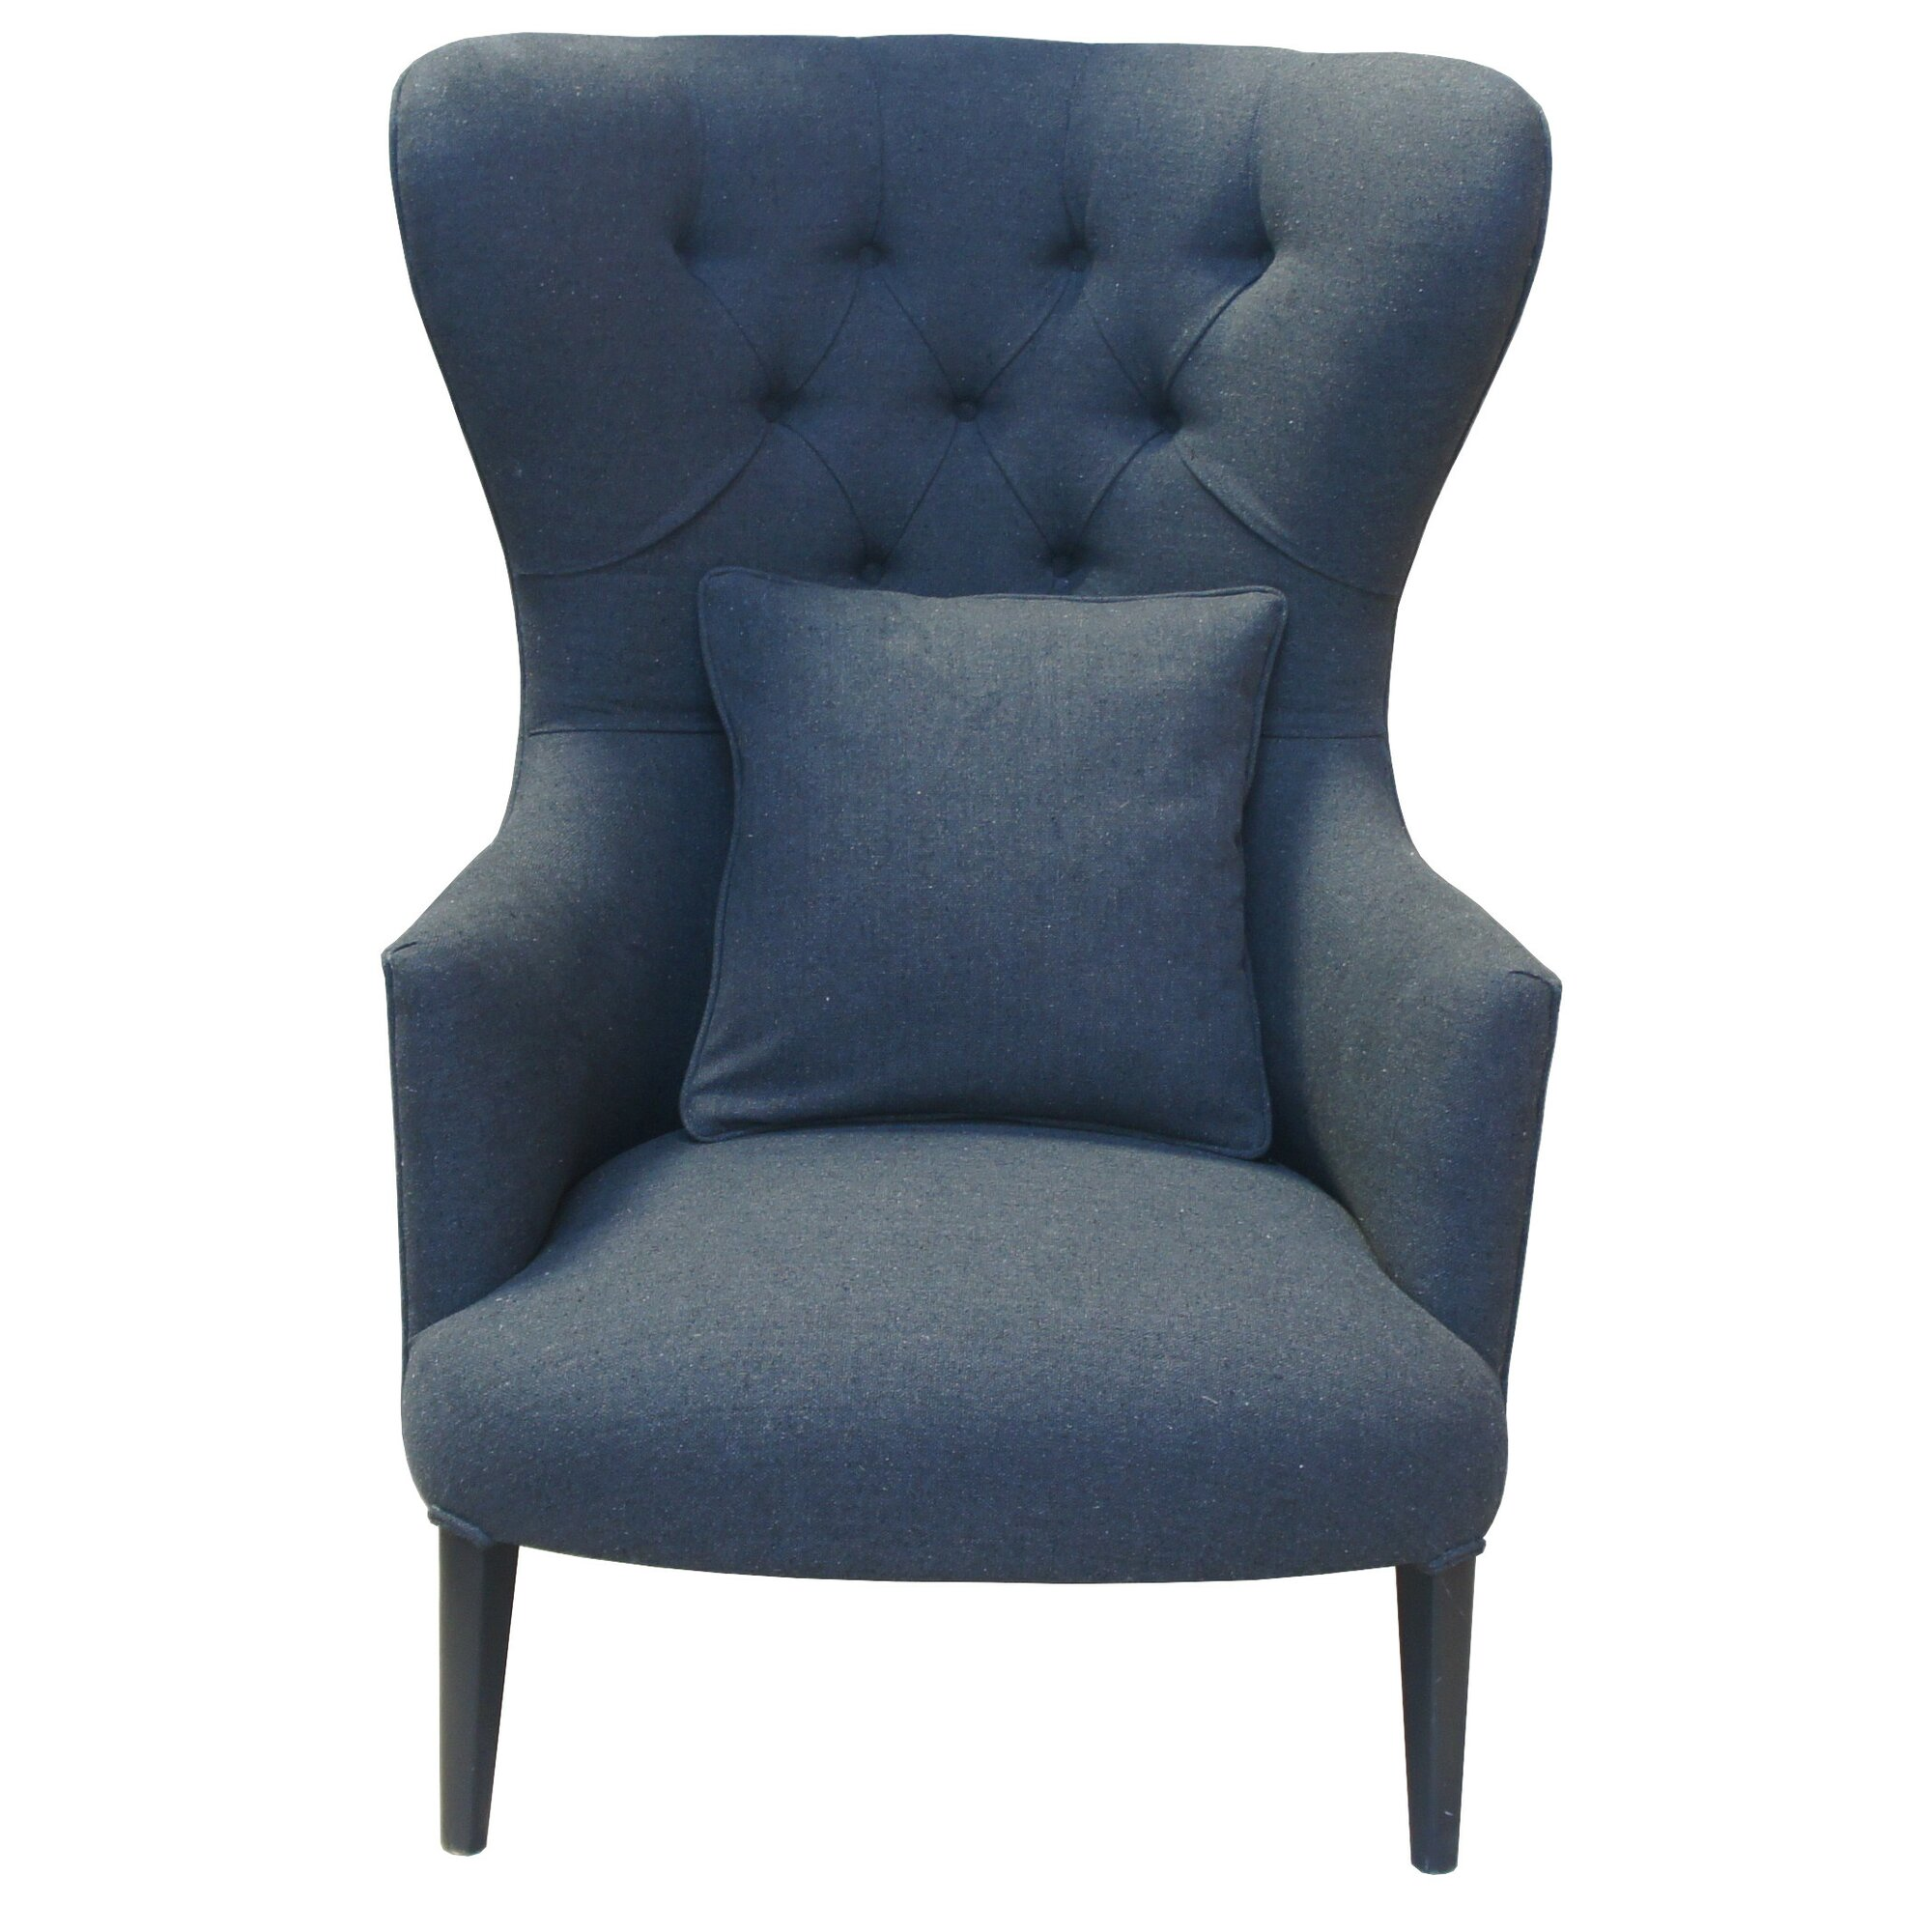 mia casa ohrensessel fauteuil oreille paris. Black Bedroom Furniture Sets. Home Design Ideas